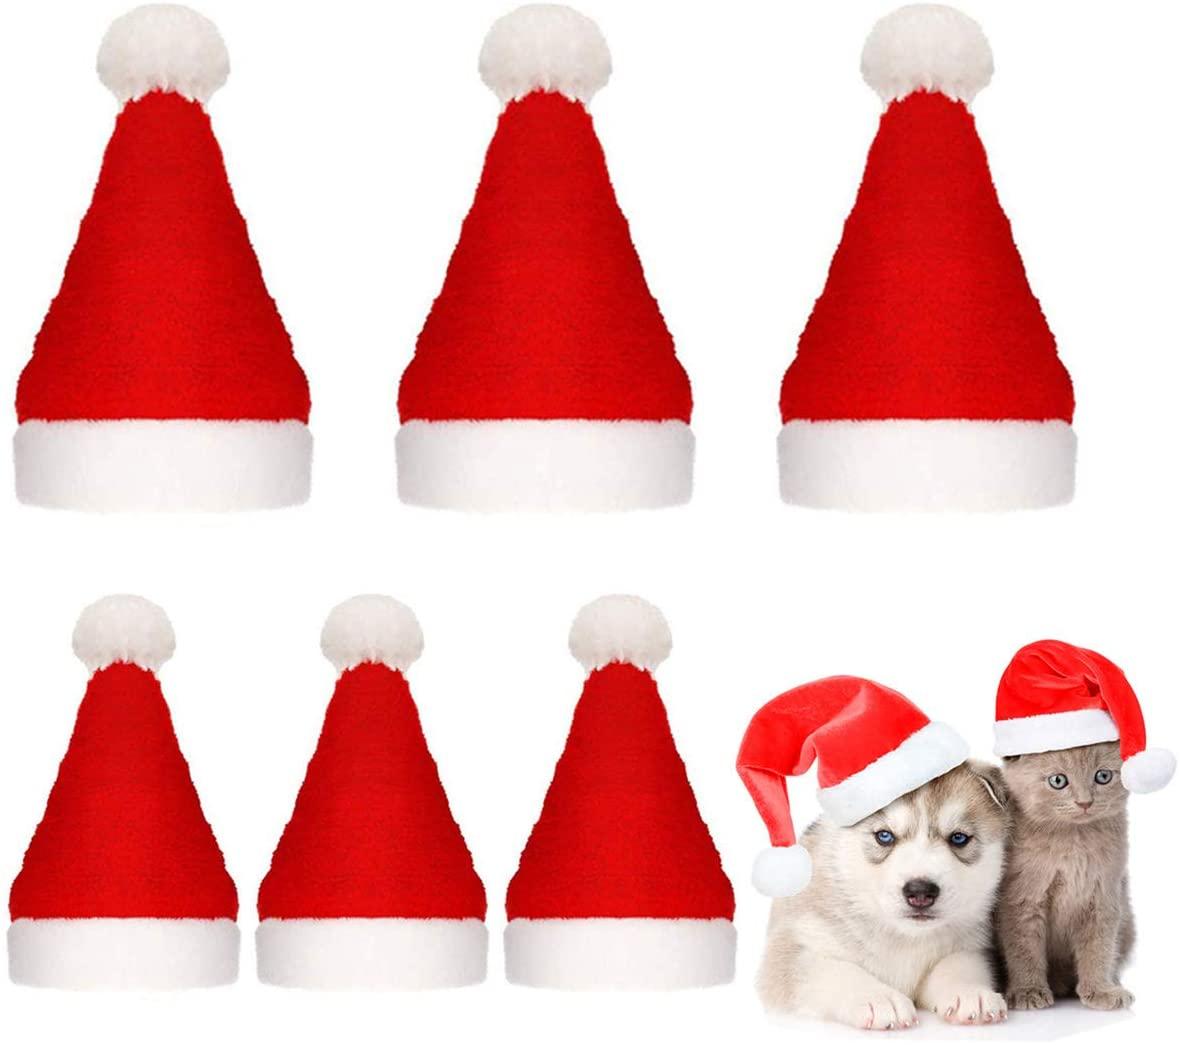 Beiabang 10 Pcs Dog Cat Pet Santa Hat Christmas Pet Costumes Santa Hat Pet Christmas Photo Props with a Christmas Drawstring Gift Bag for Puppy Kitten Small Cats Dogs